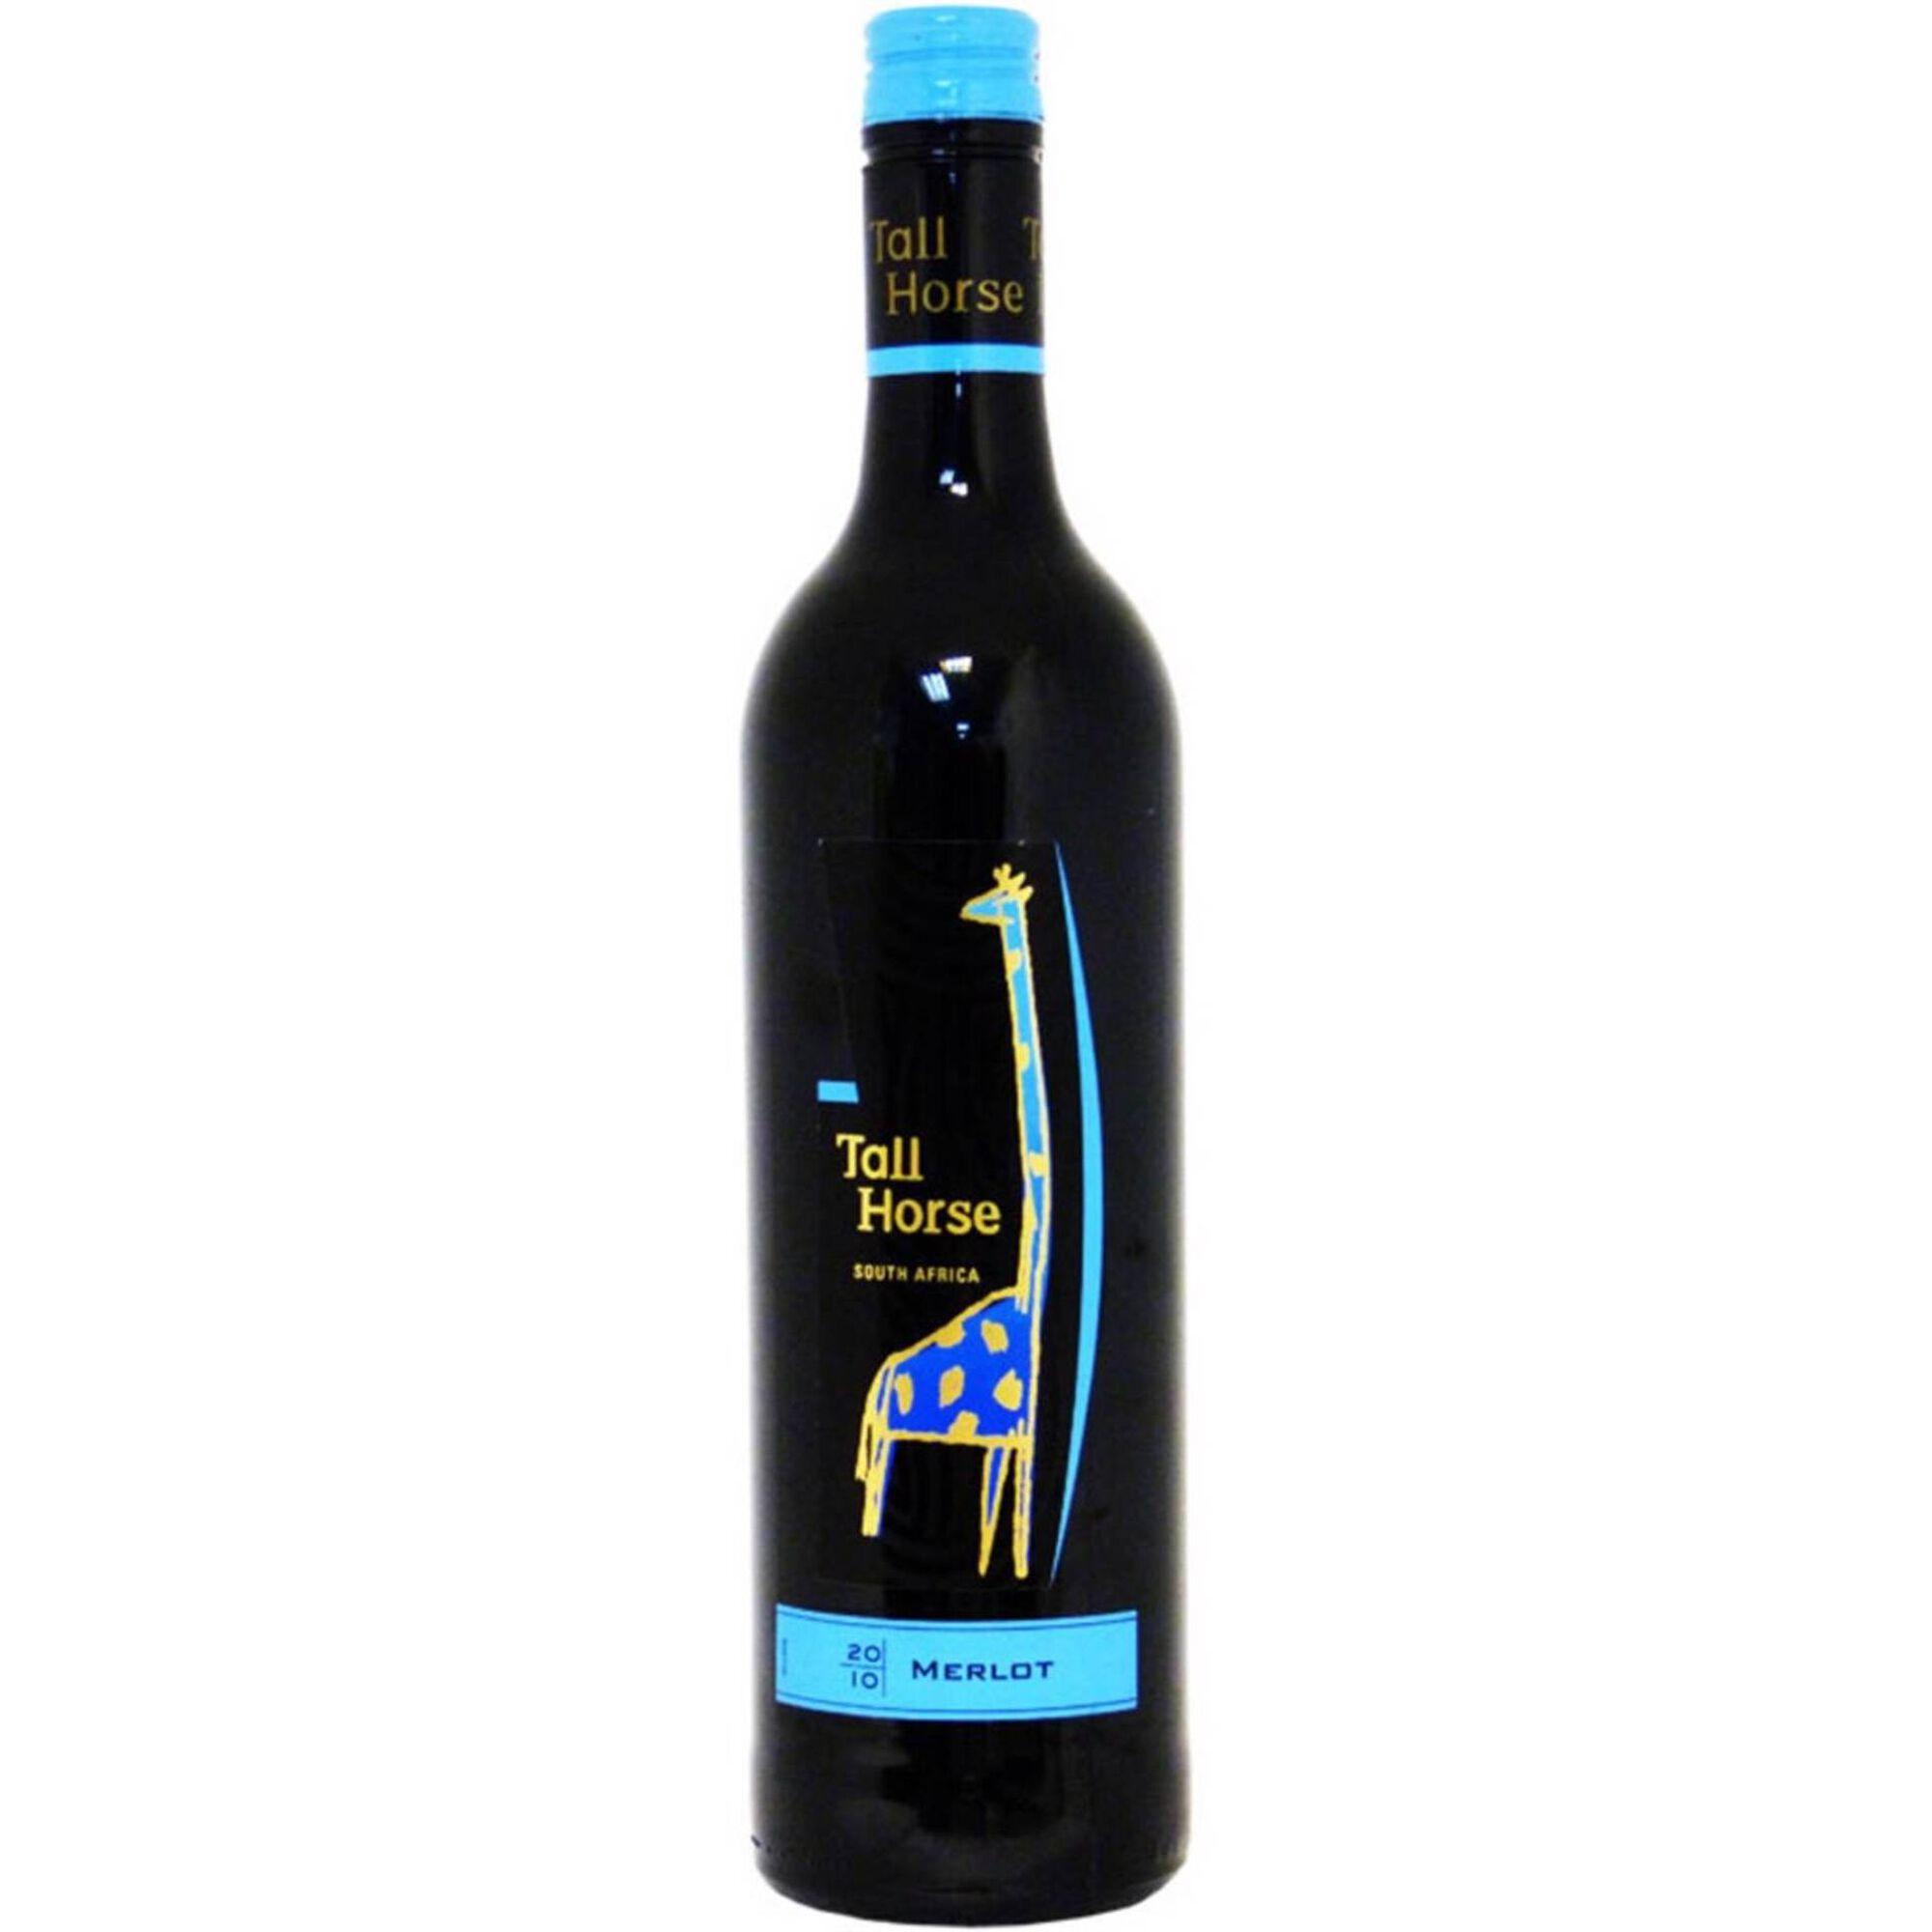 Tall Horse Merlot África Sul Vinho Tinto